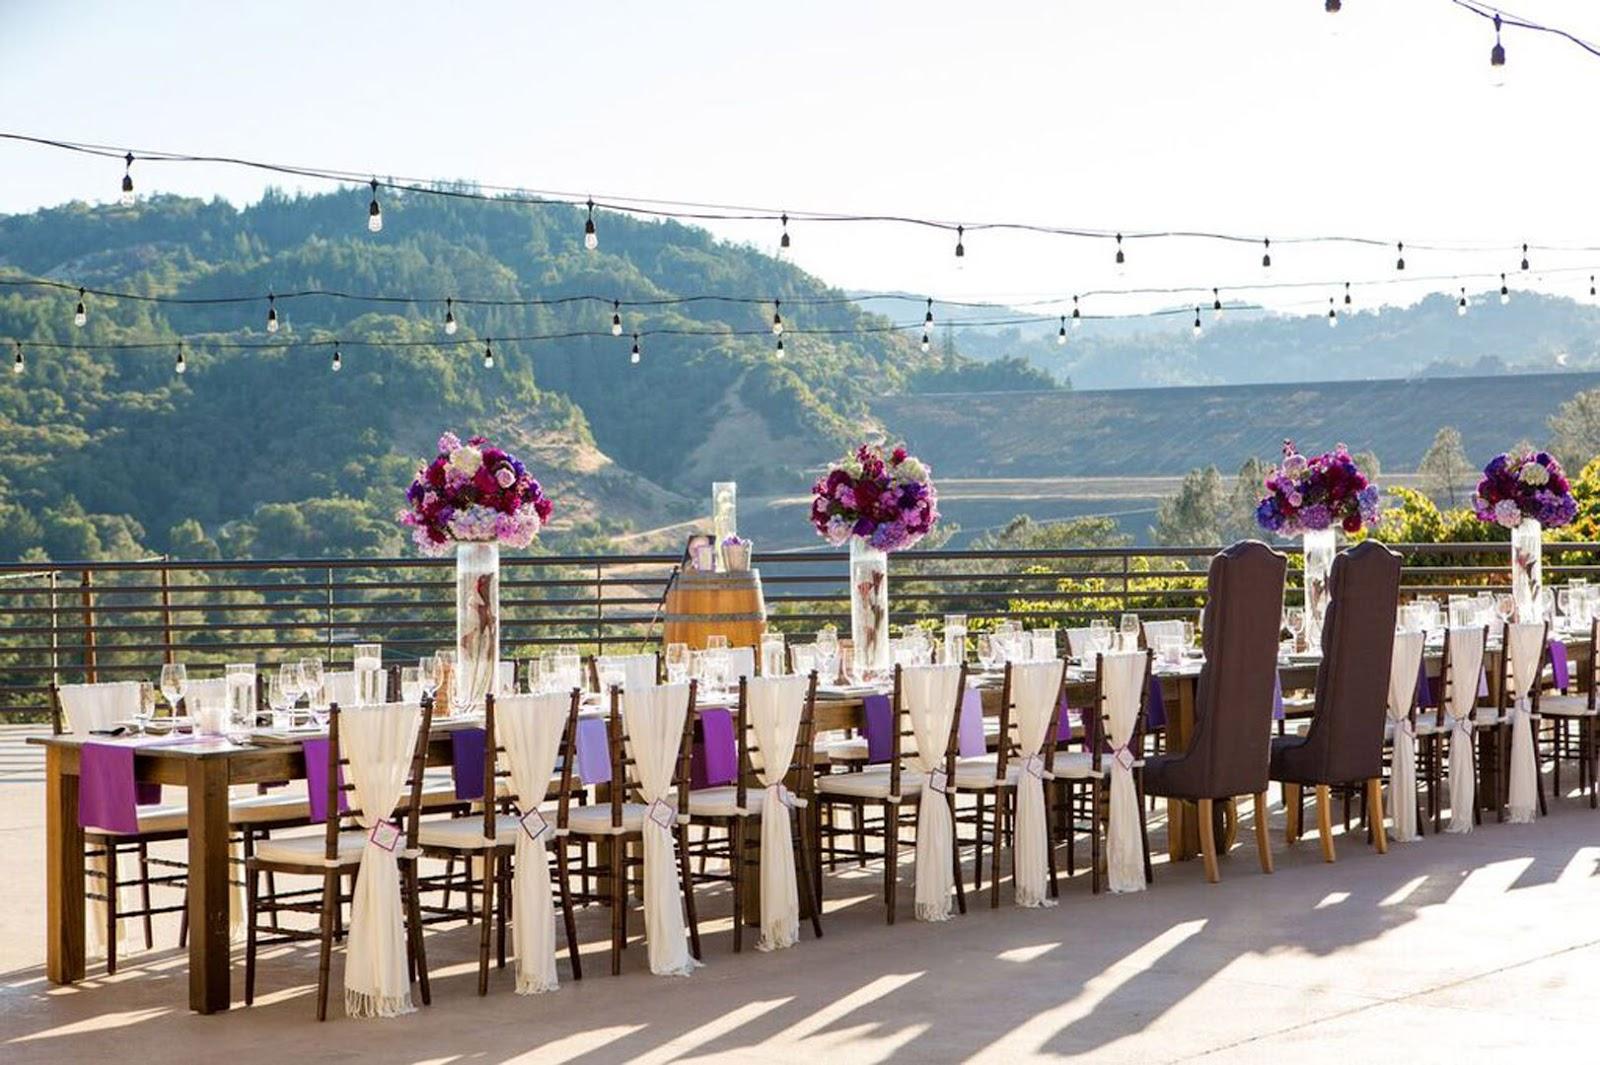 dinner table for wedding overlooking vineyards